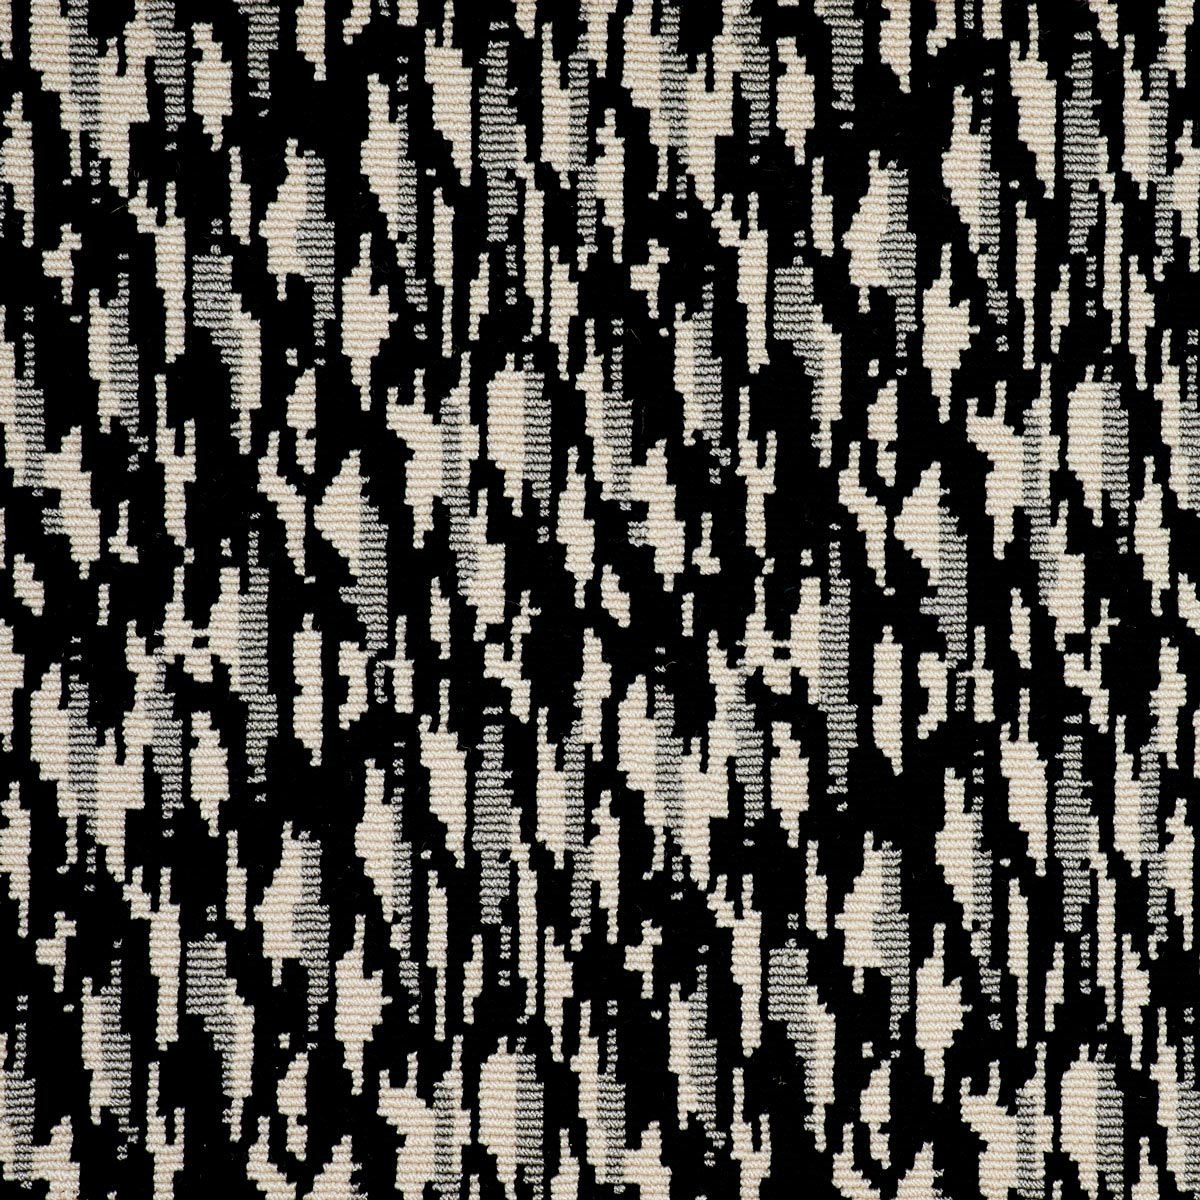 pennyworth_wool-nylon_broadloom_patterson-flynn-martin_pfm